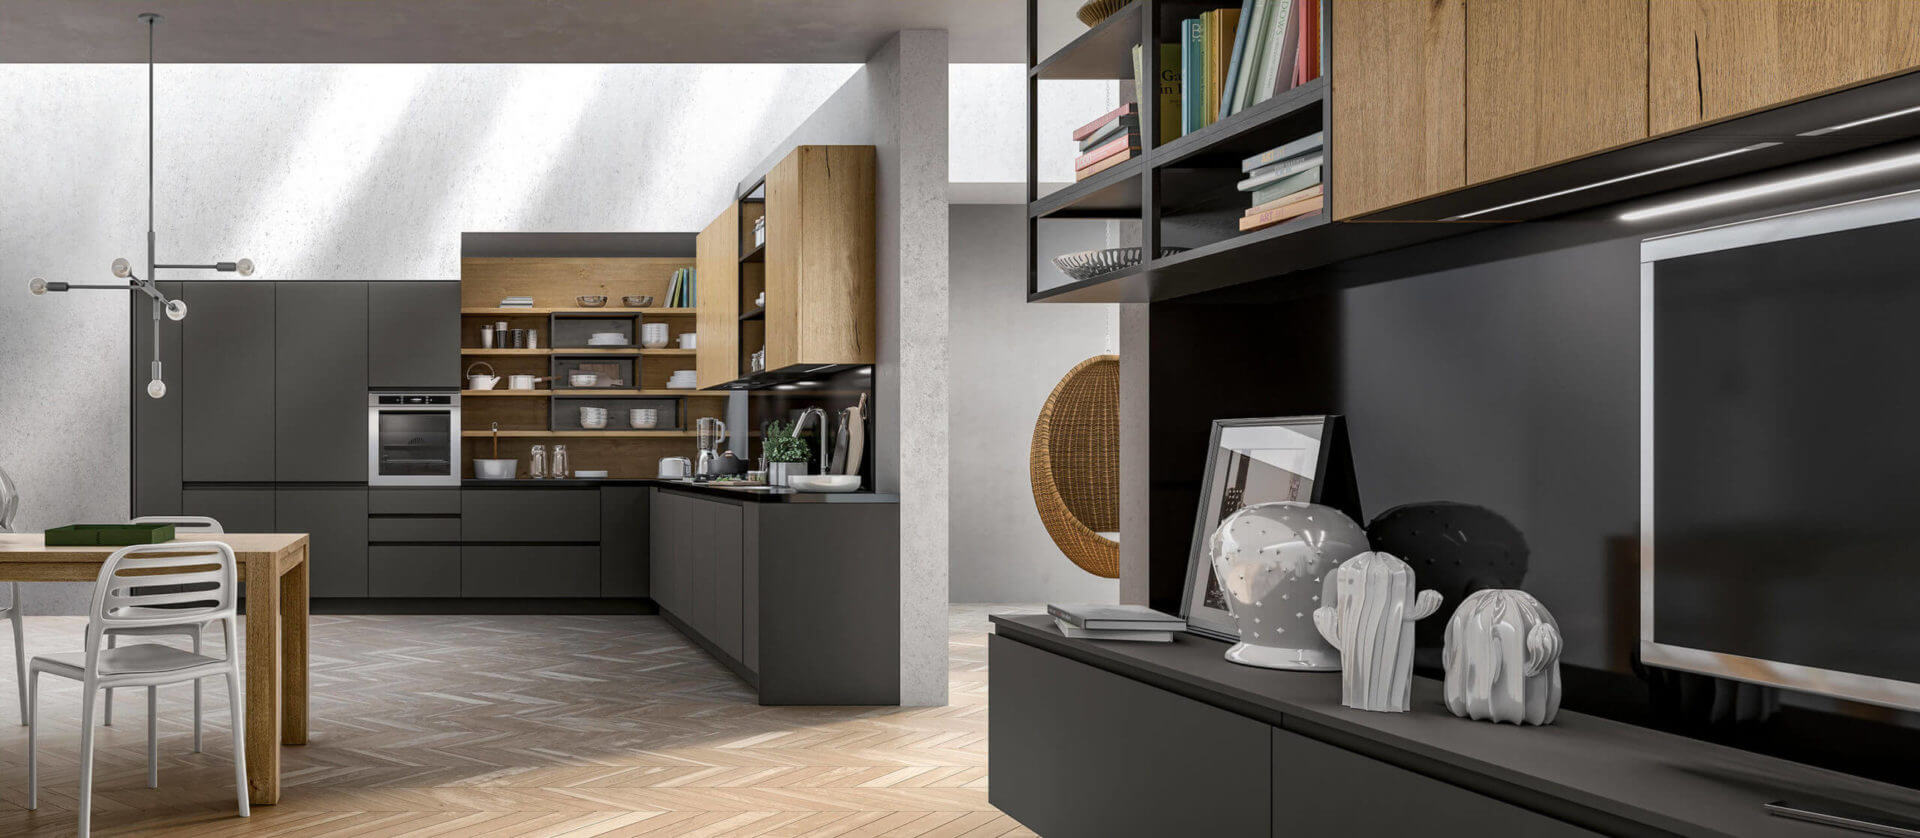 cucina design wega